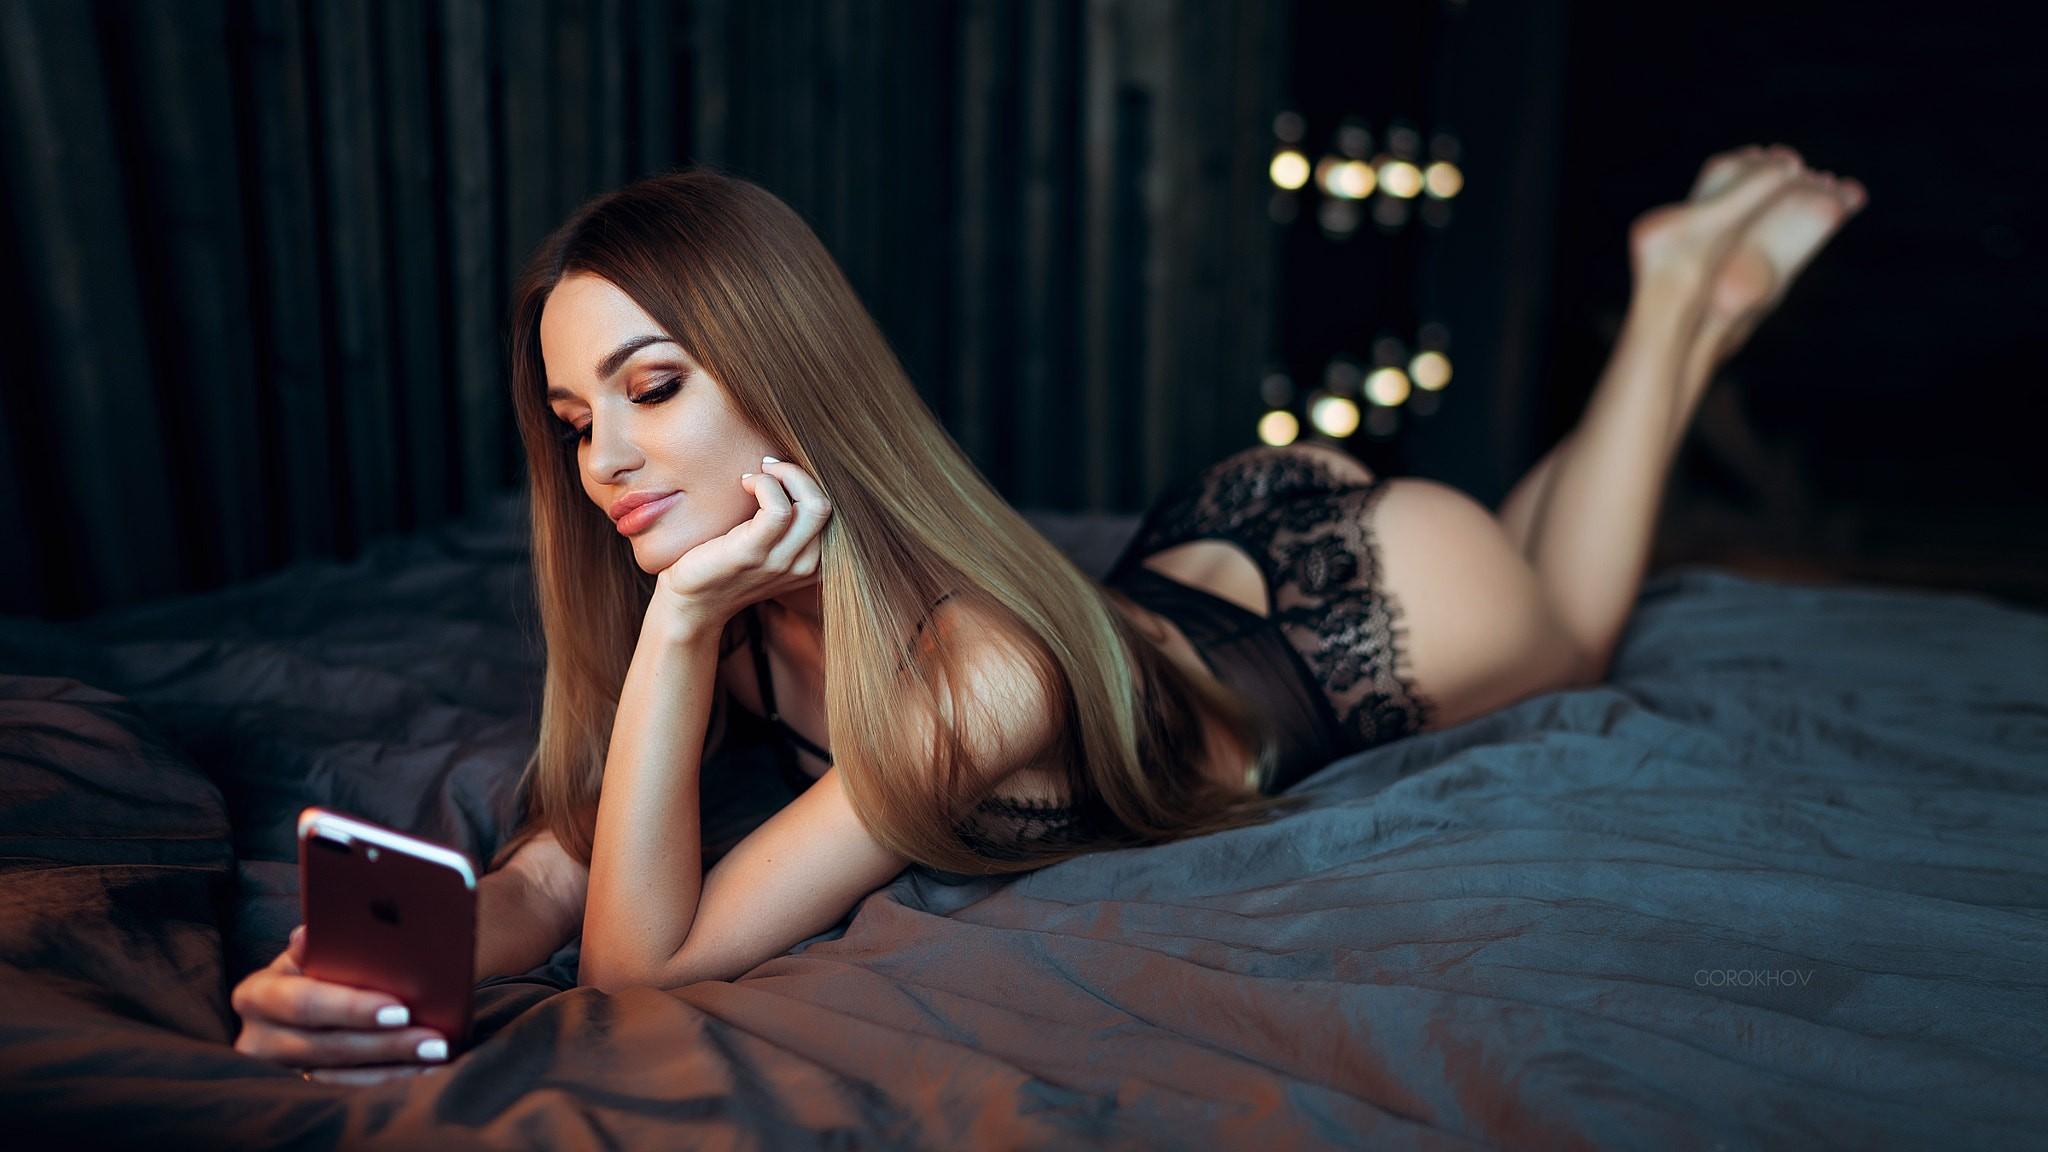 People 2048x1152 women ass cellphone Ivan Gorokhov black lingerie in bed lying on front white nails depth of field brunette straight hair long hair